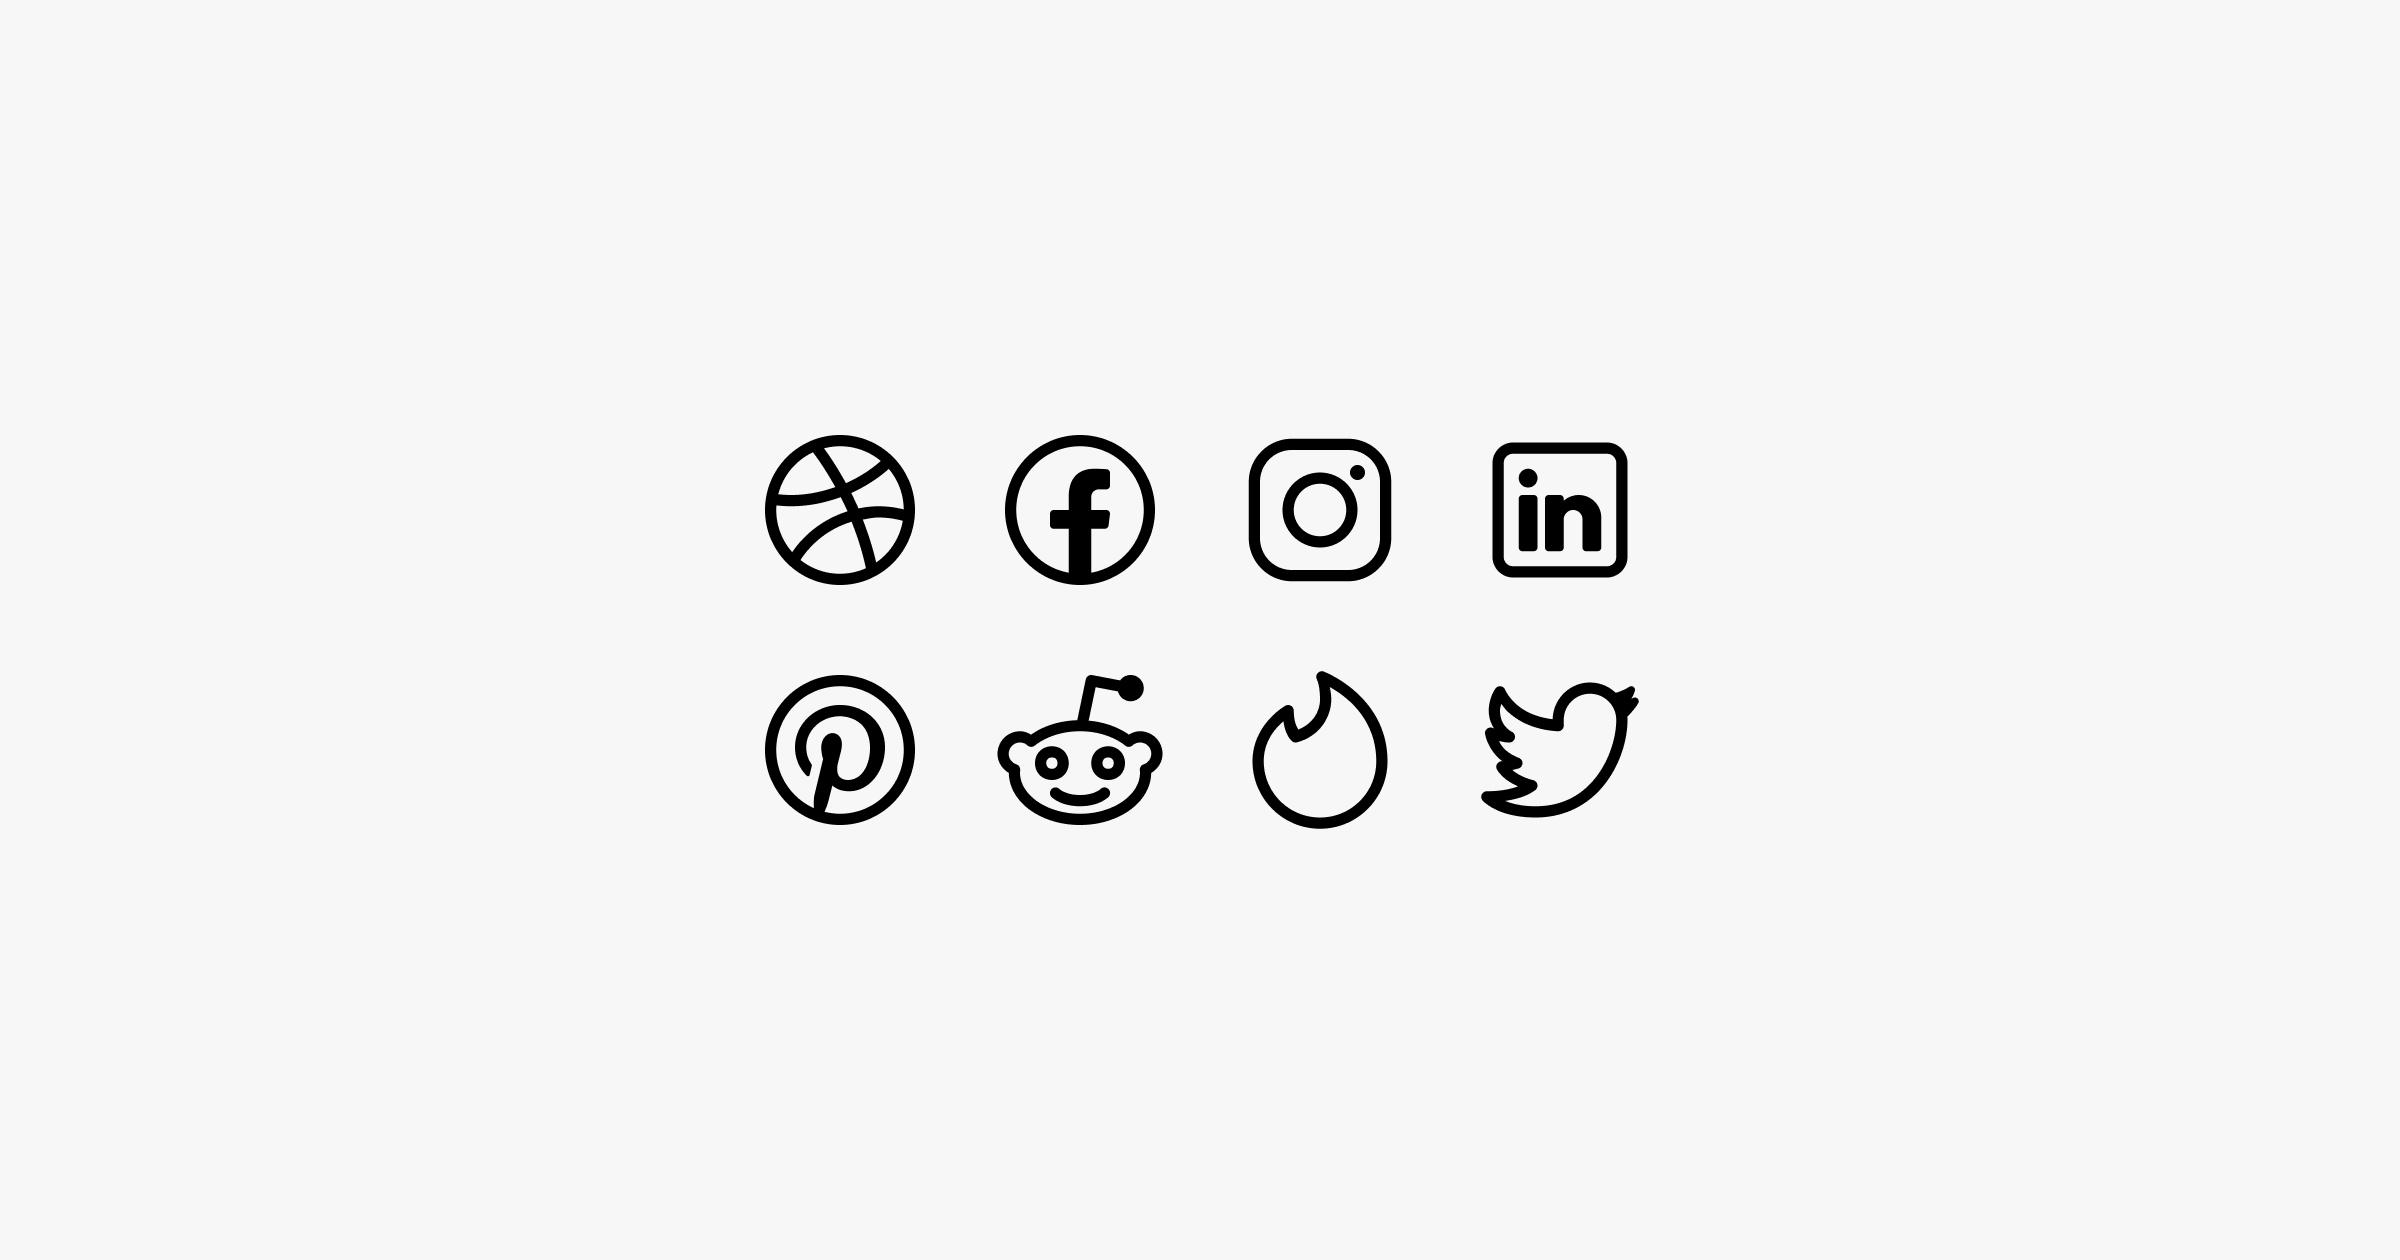 fluent system icons social media